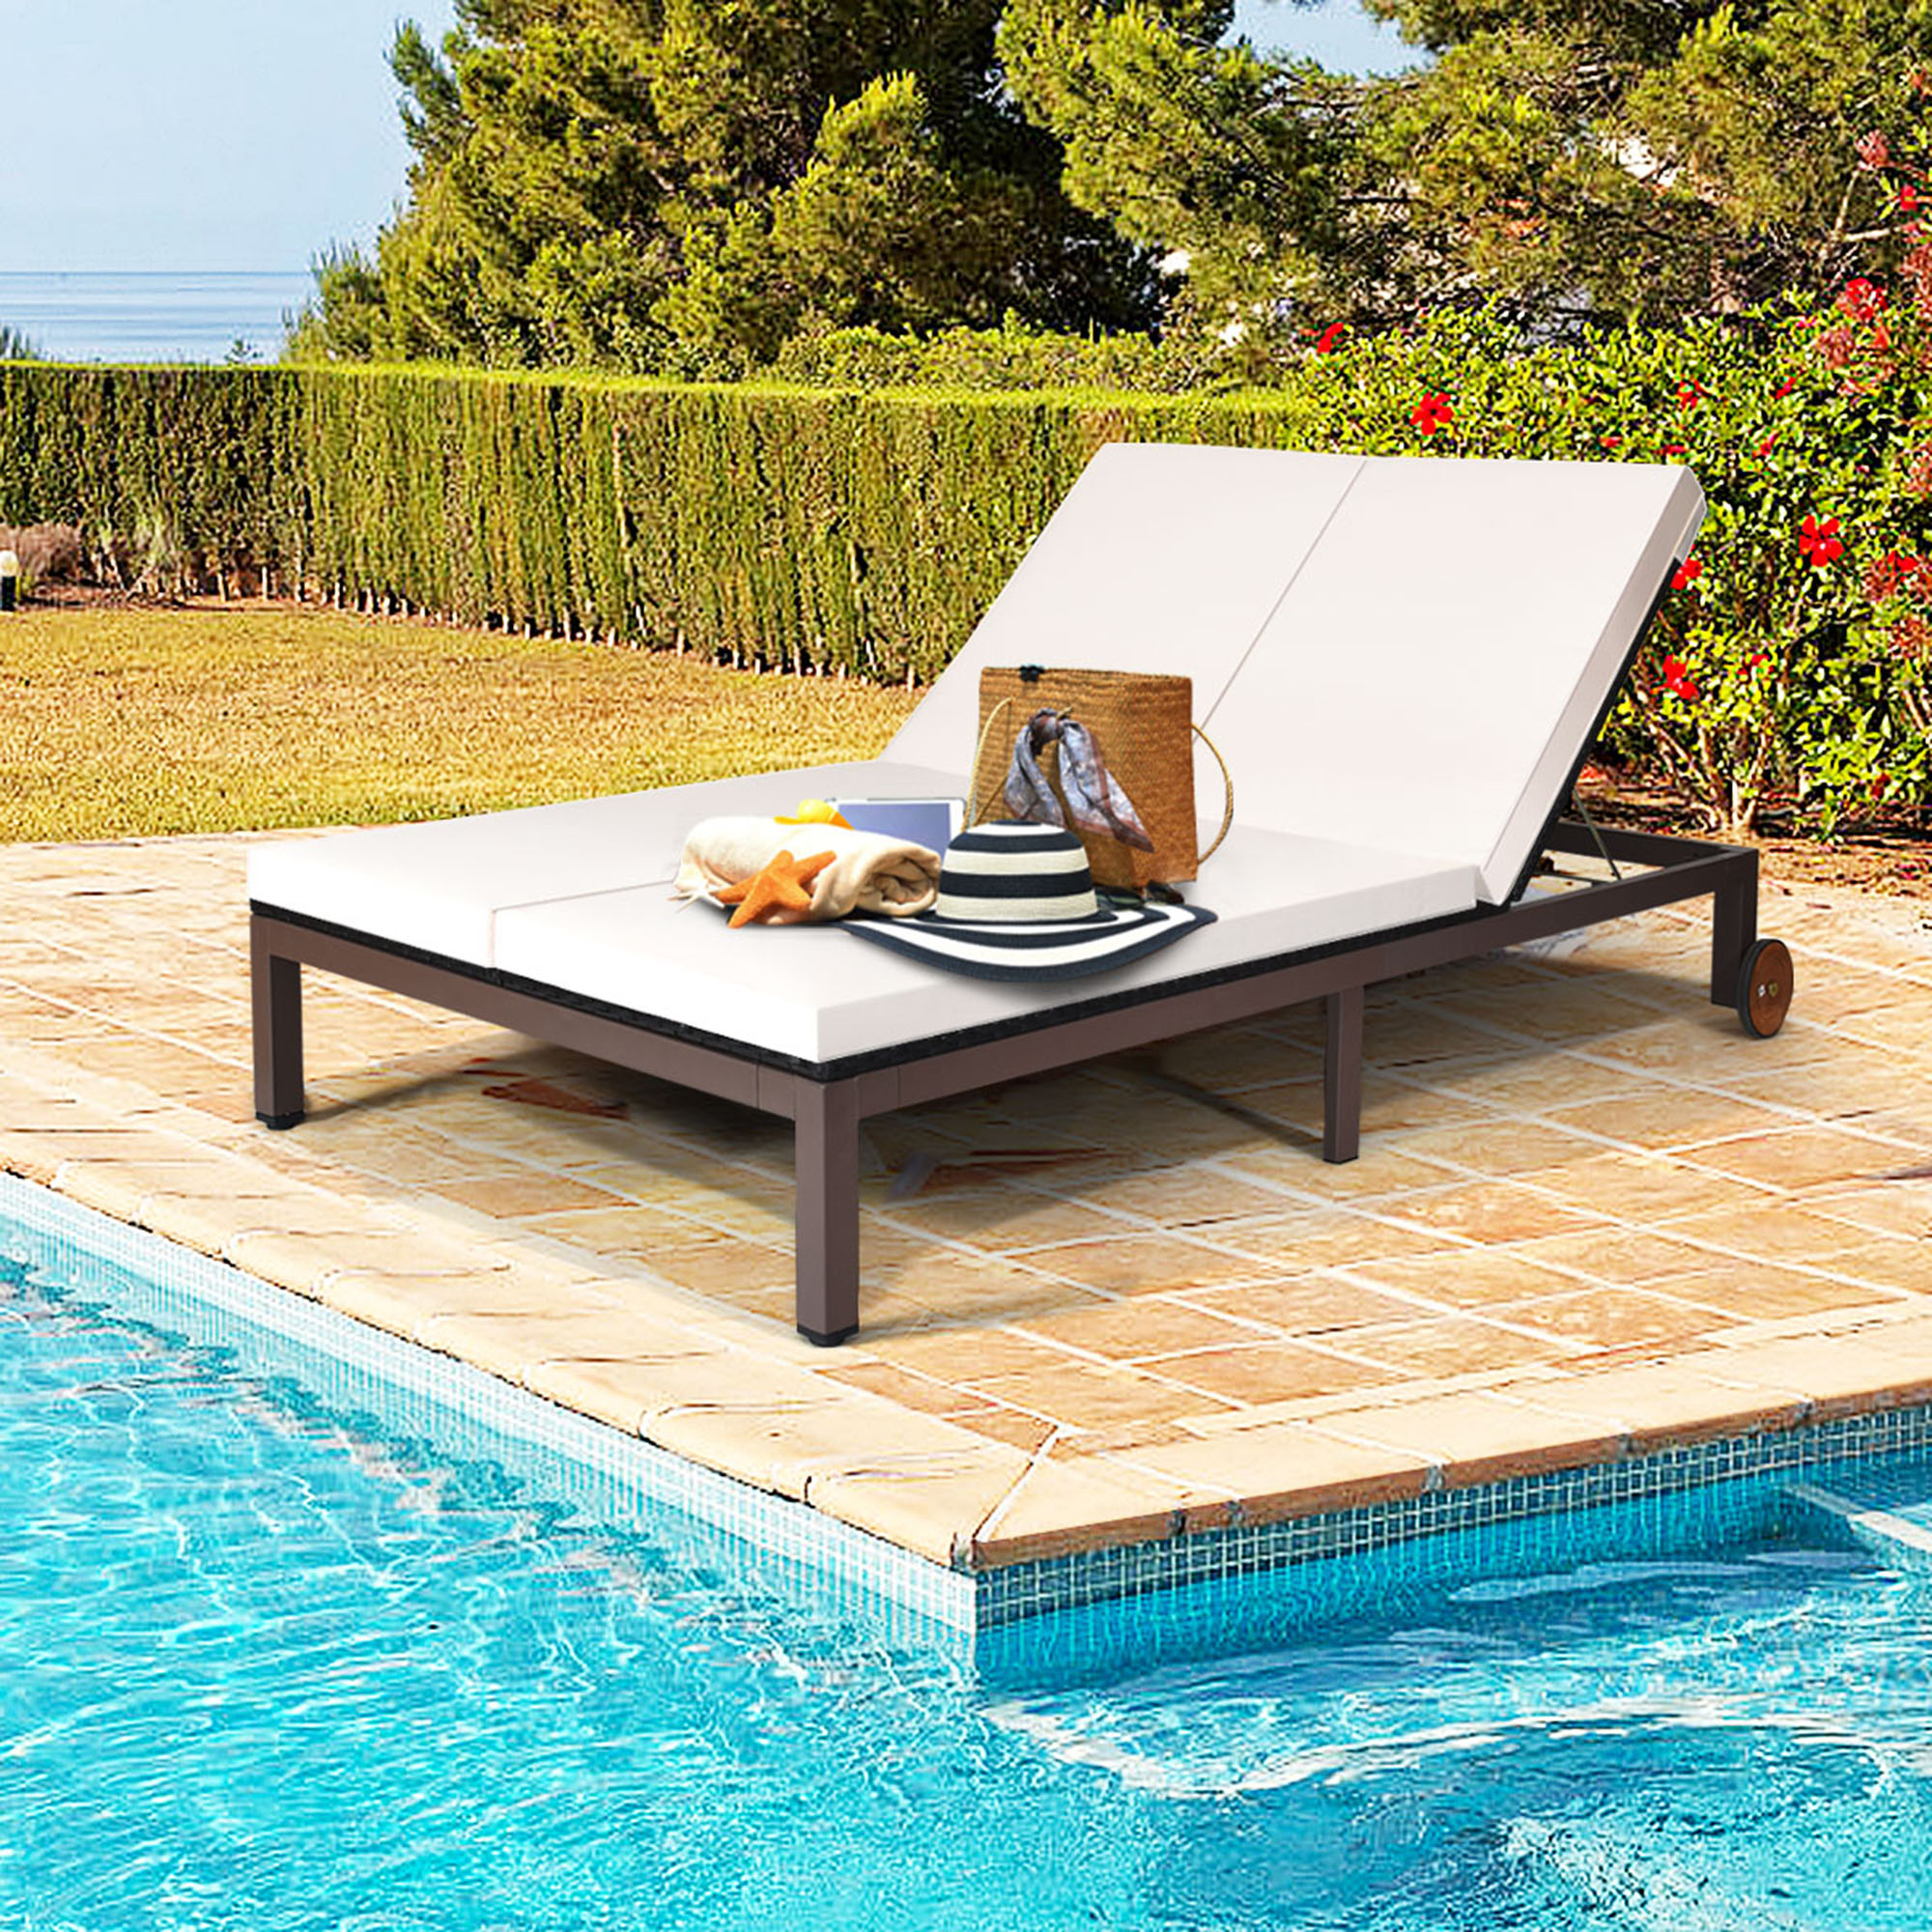 gymax adjustable patio rattan 2 person recliner lounge chair w cushion wheel walmart com